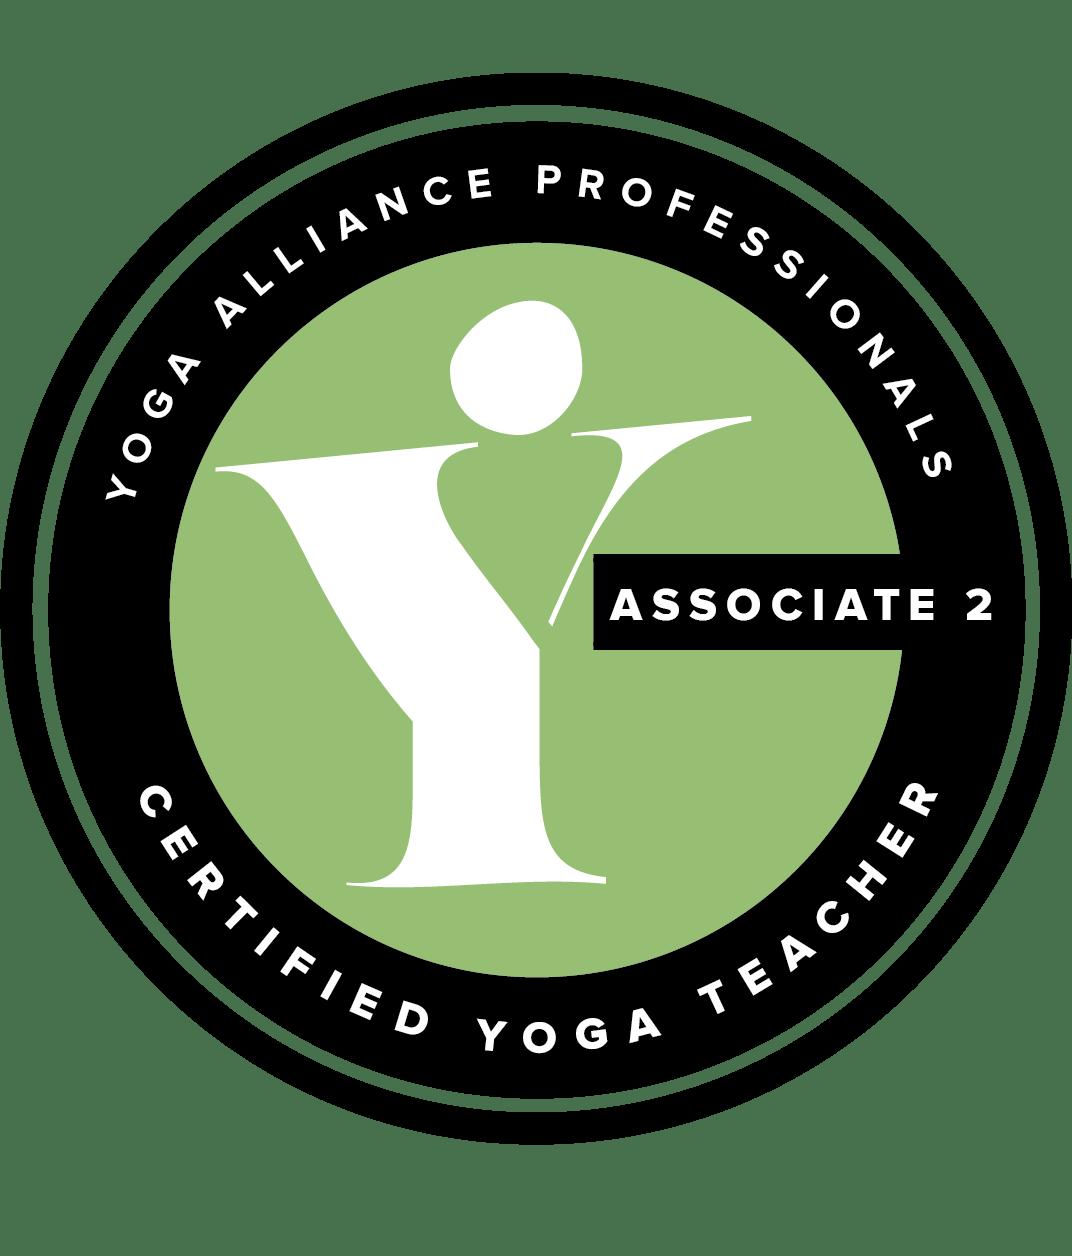 yapo-teacher-associate-2